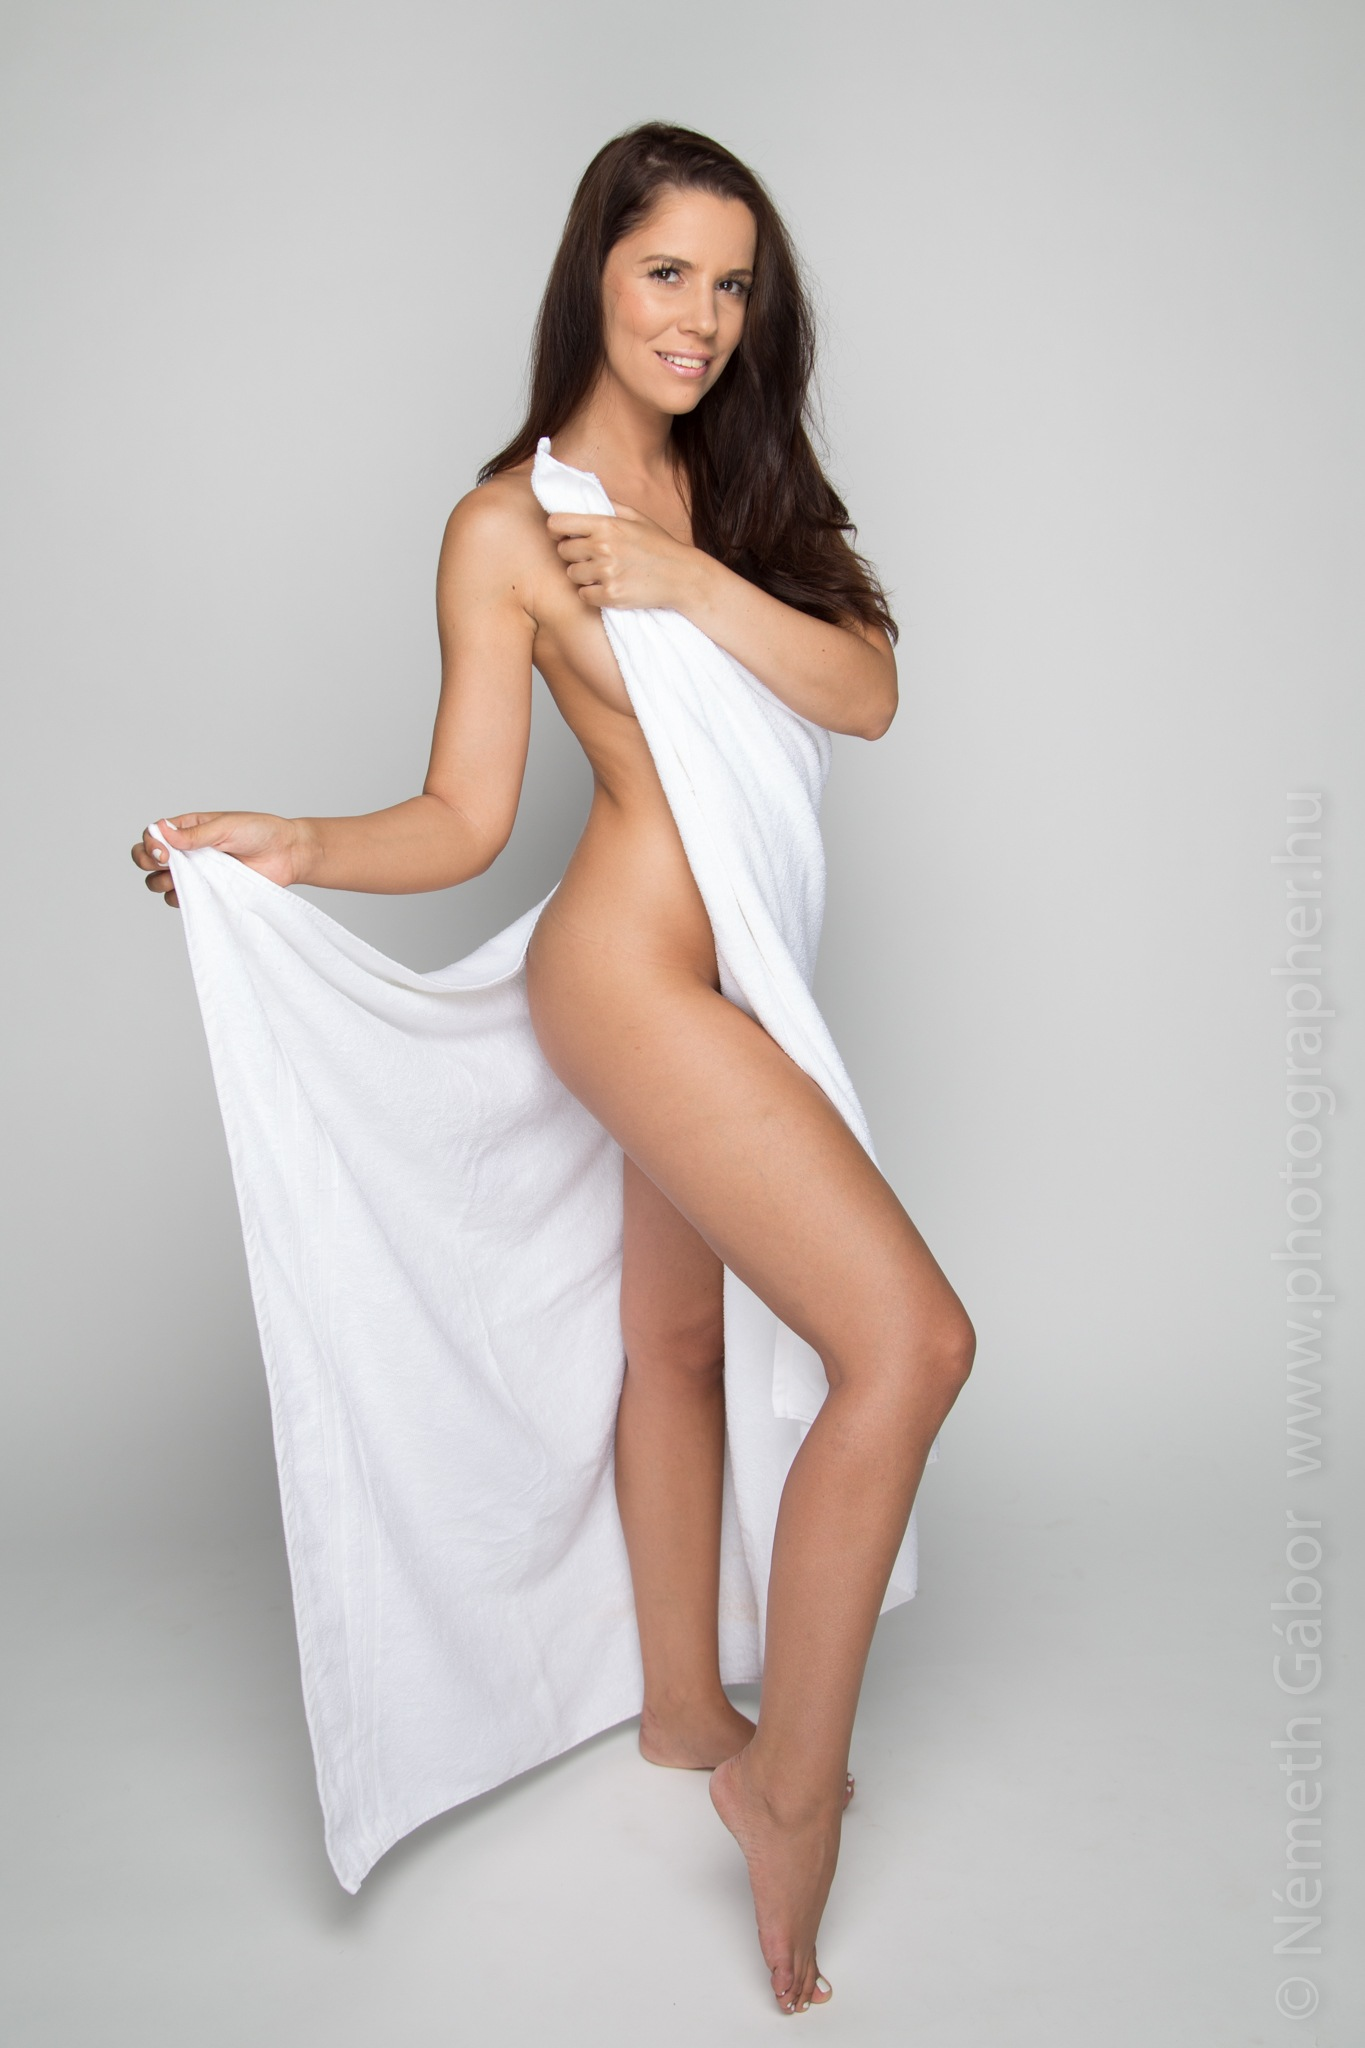 Towel Project by photographerhu